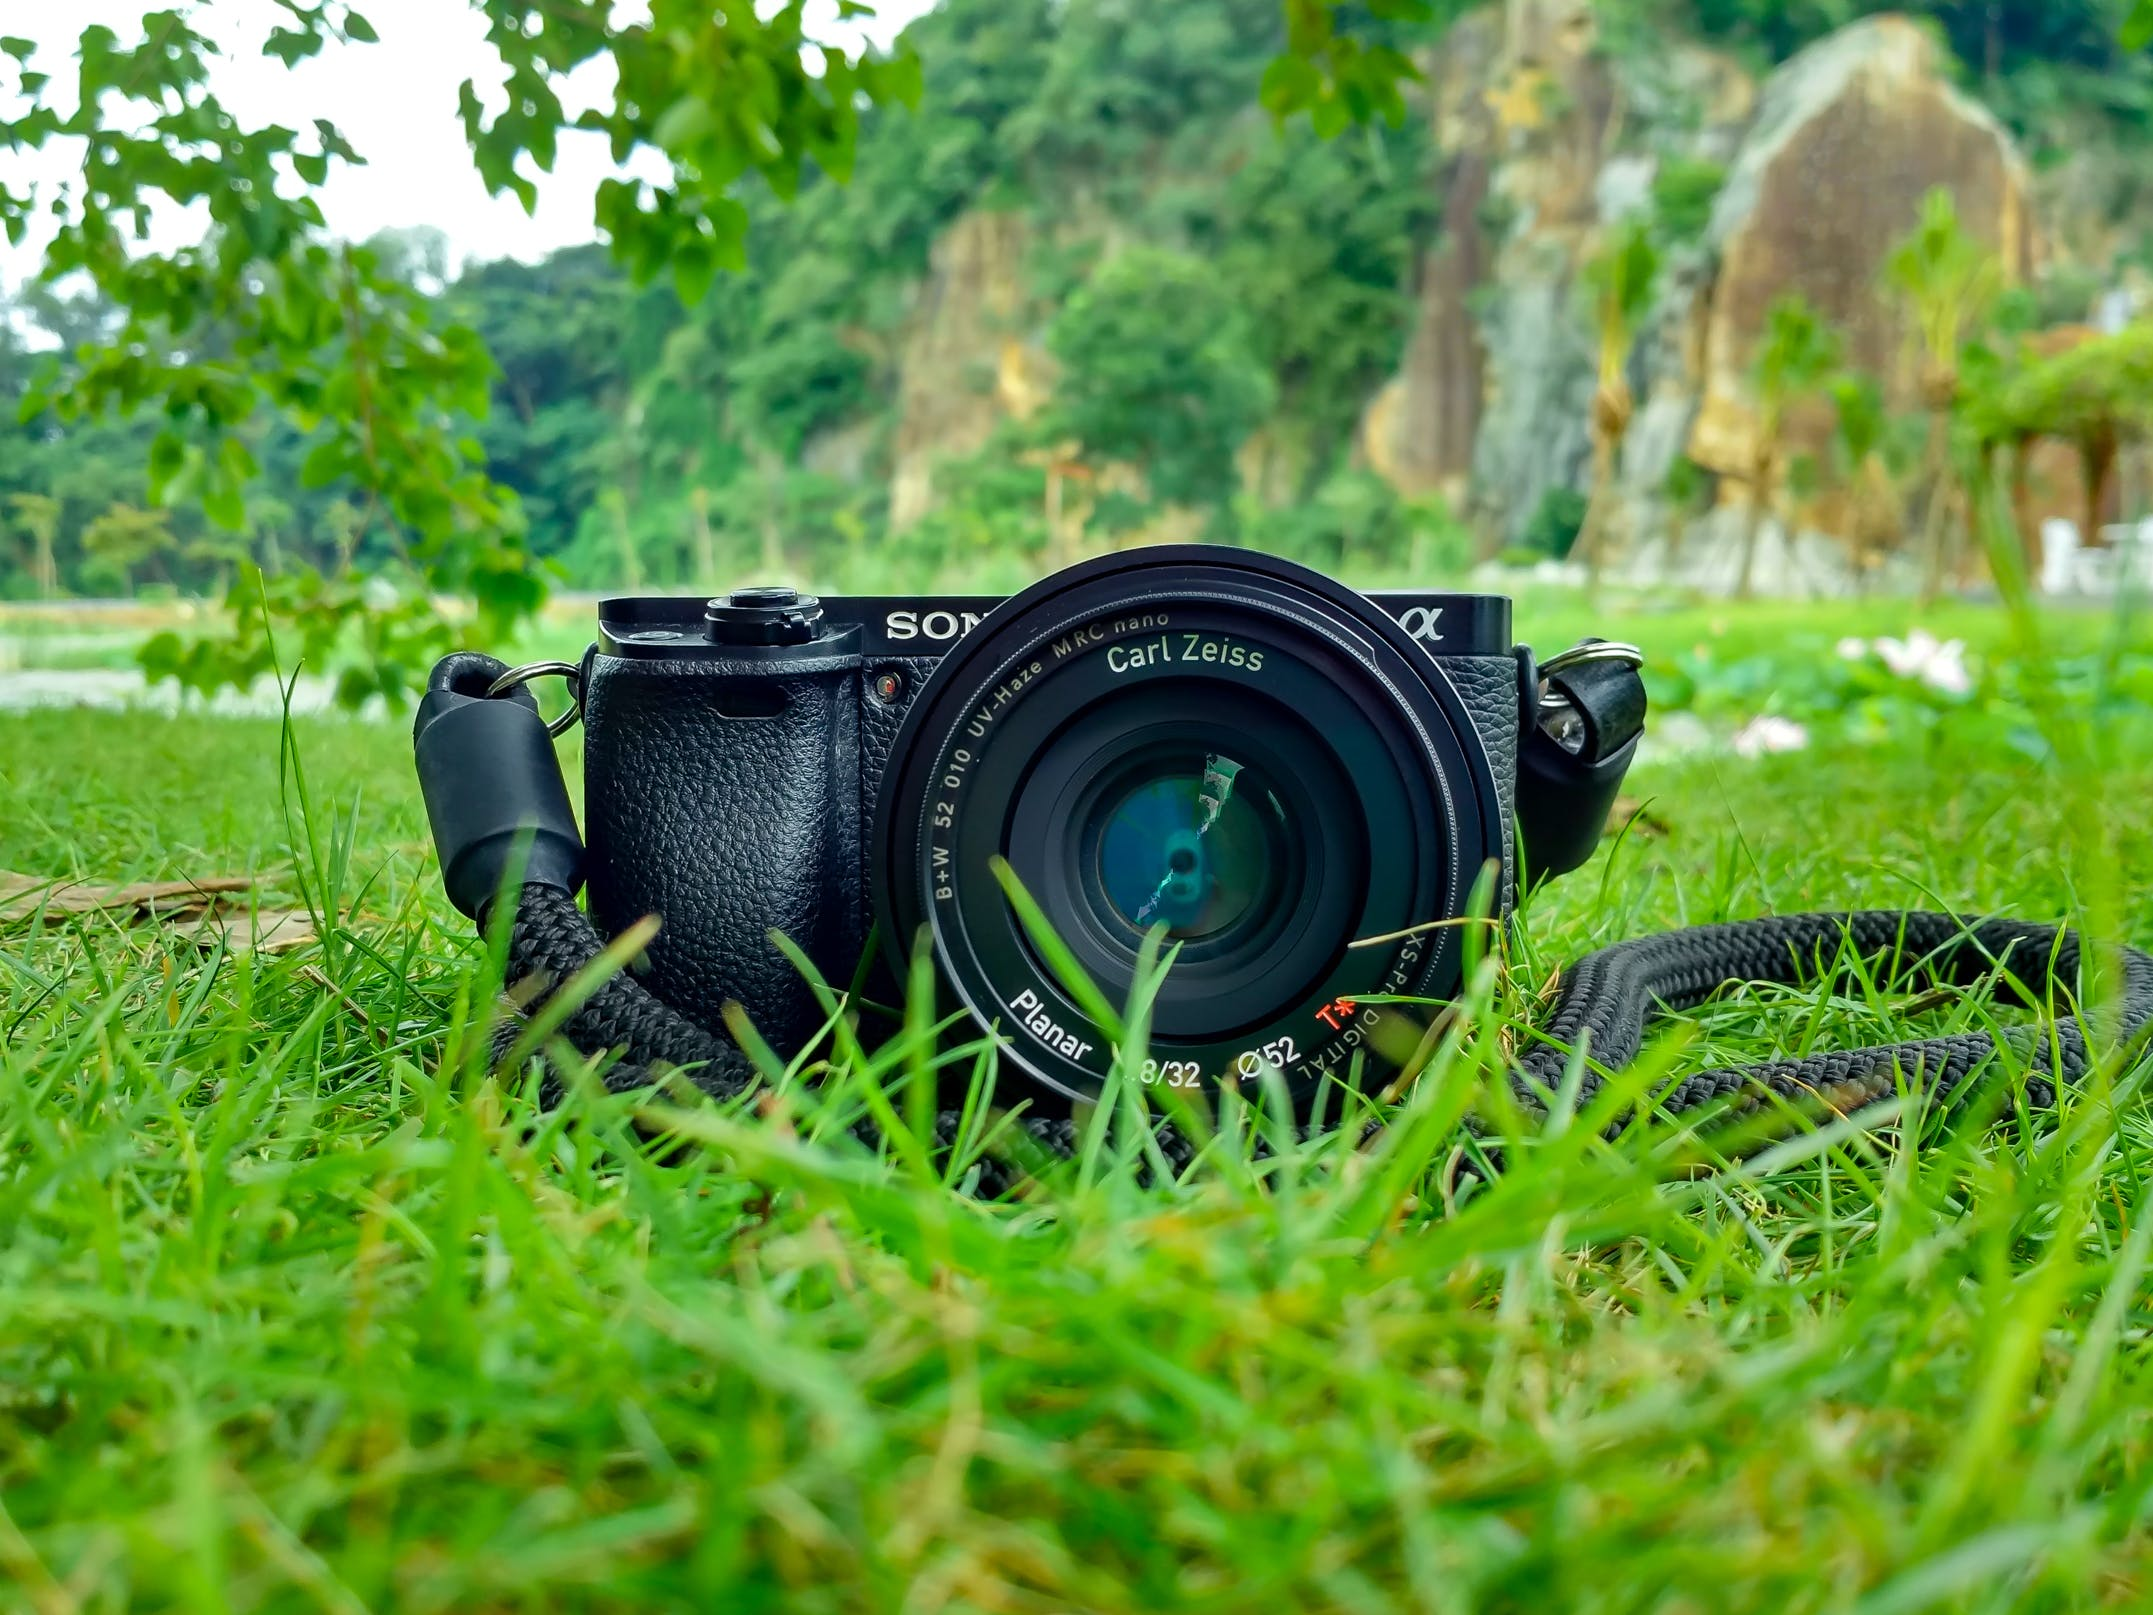 Kostenloses Stock Foto zu kamera, feld, fotografie, gras